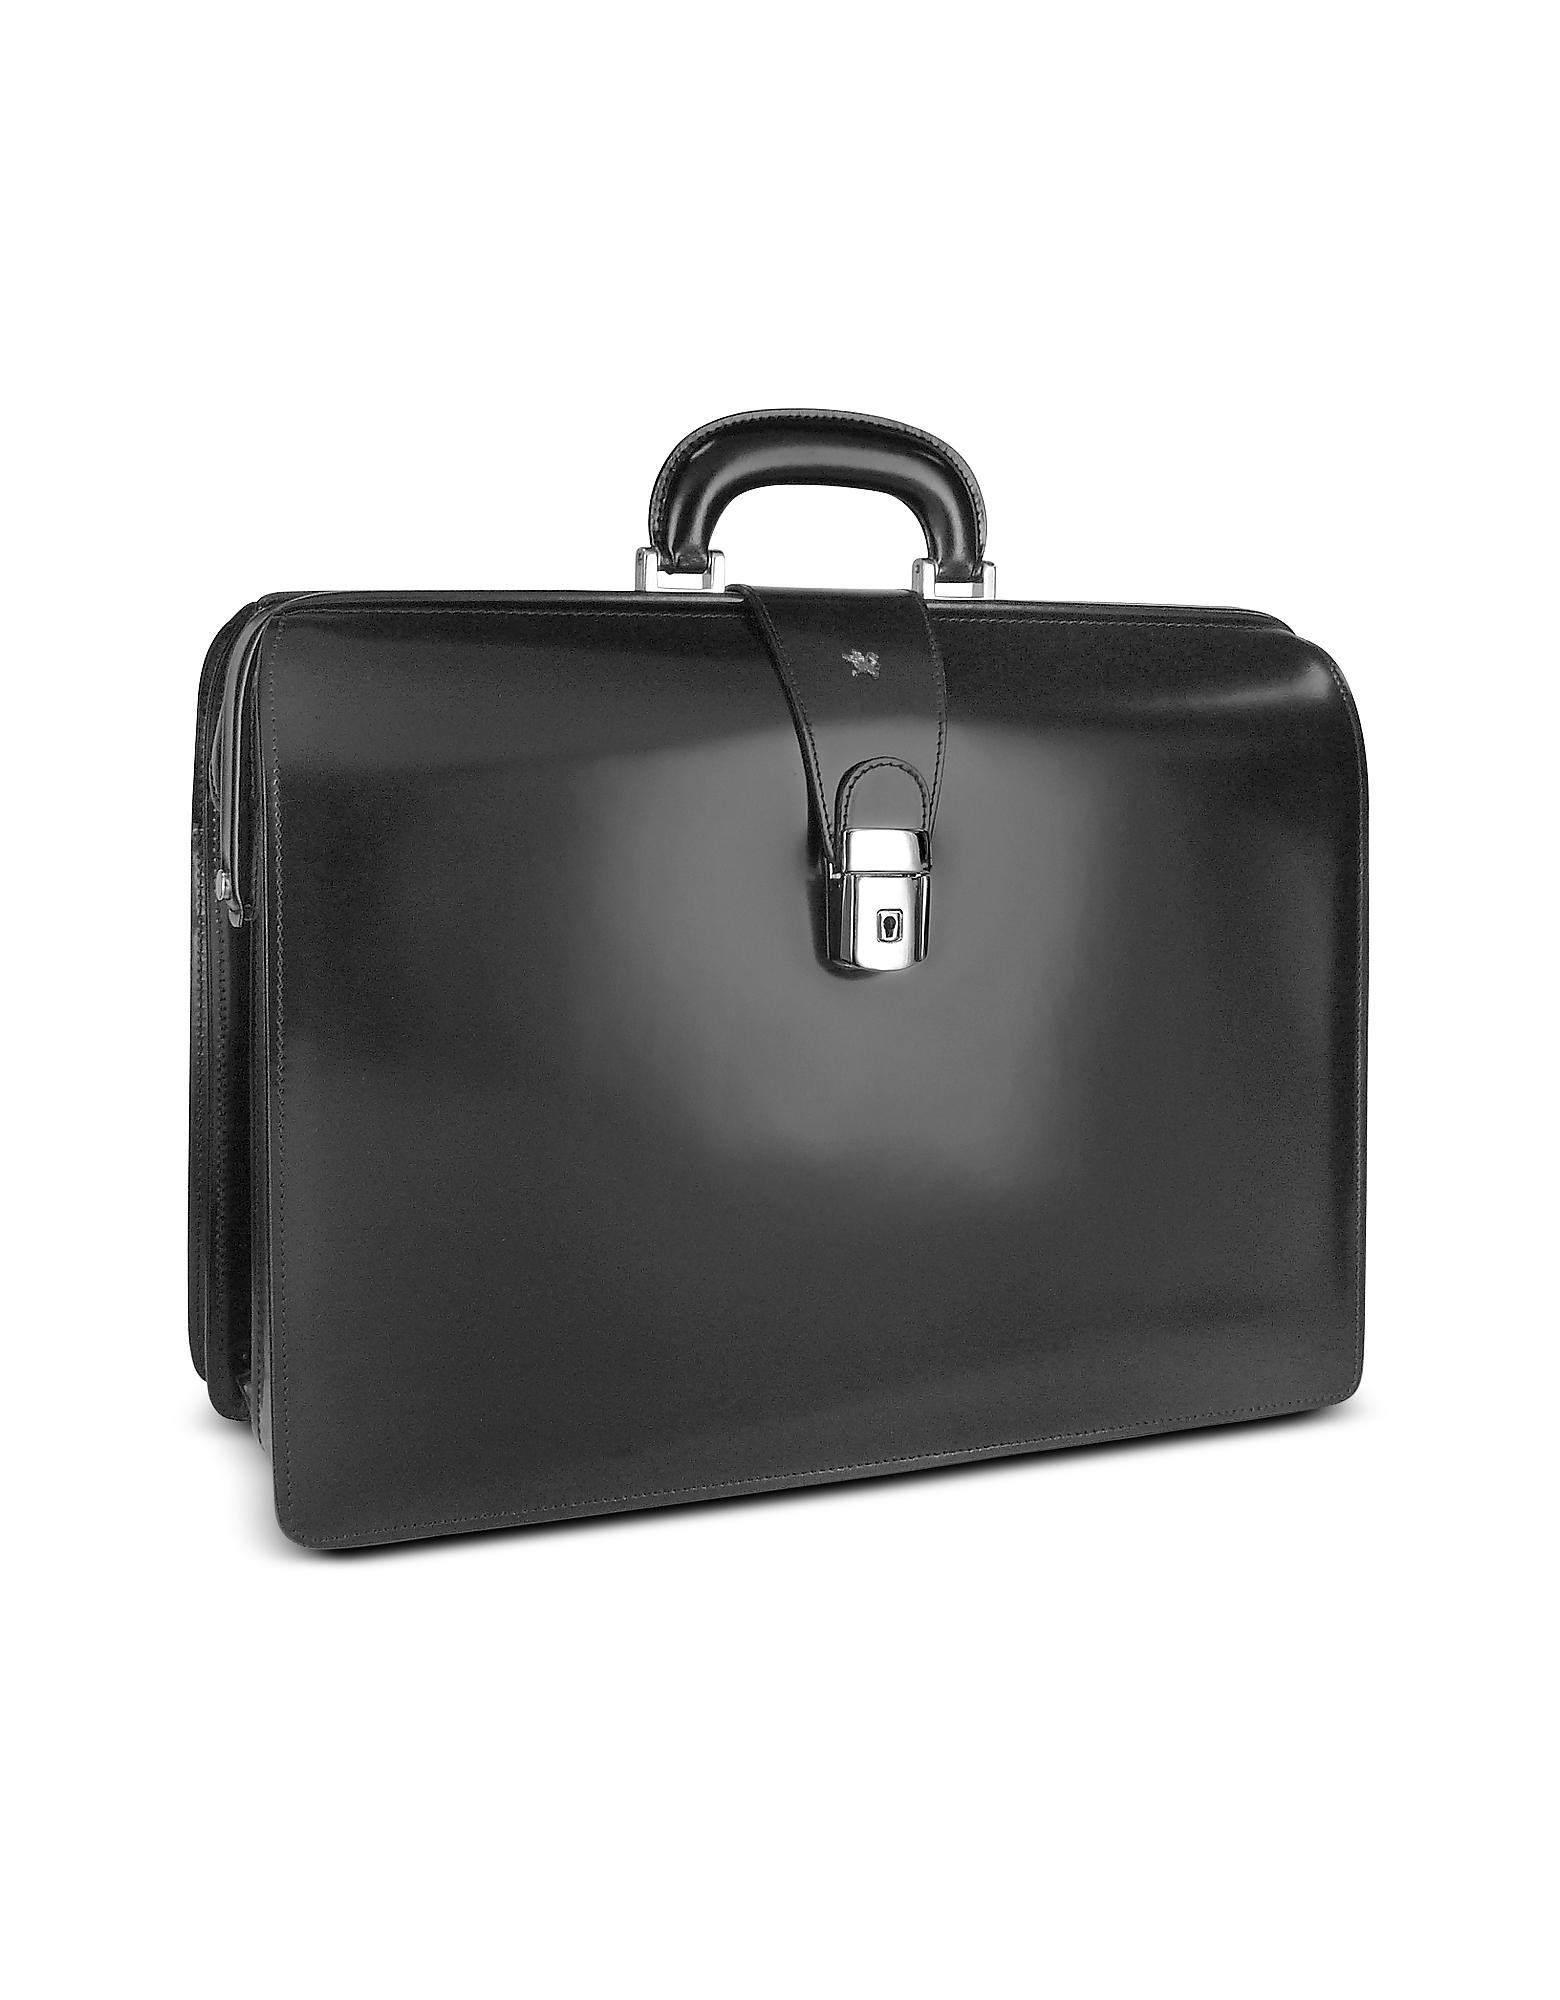 Pratesi Designer Briefcases,  Men's Leather Doctor Bag Briefcase w/Interior Lighting